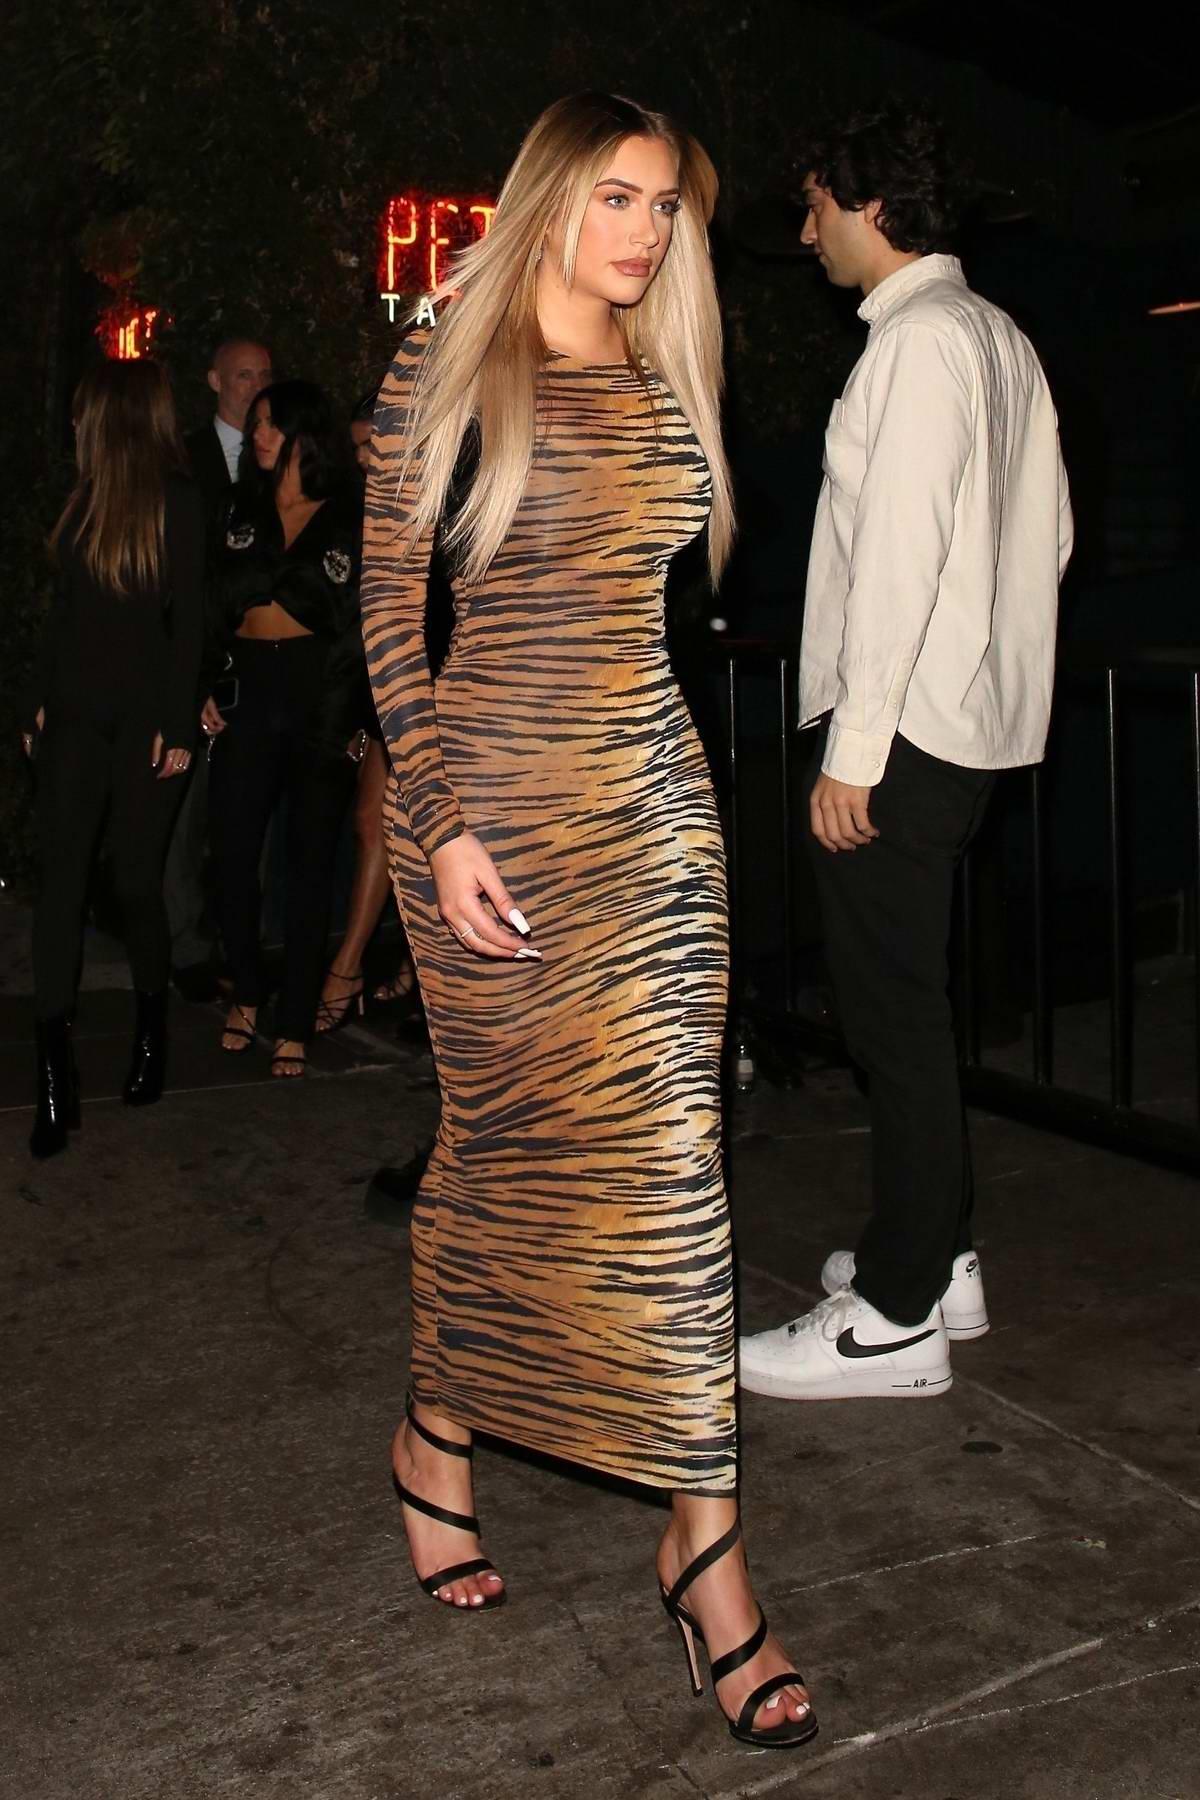 Anastasia Karanikolaou attends Billie Eilish's Grammys After-Party in Los Angeles